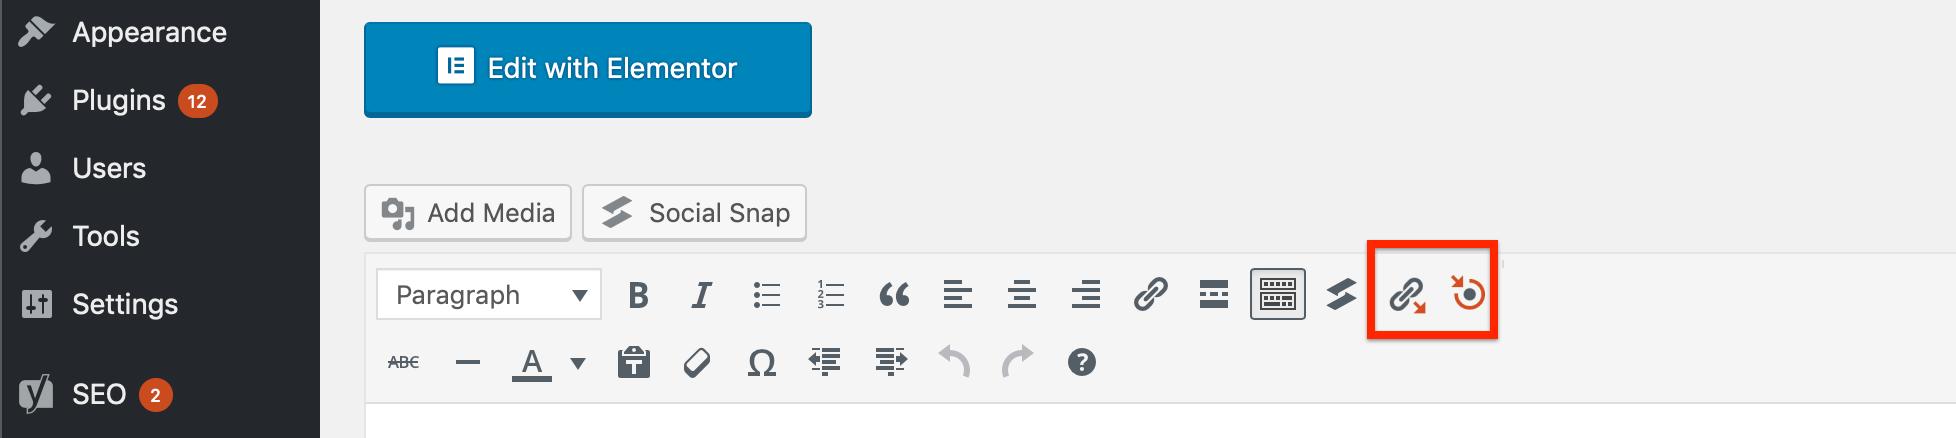 plugin-icons-in-the-editor